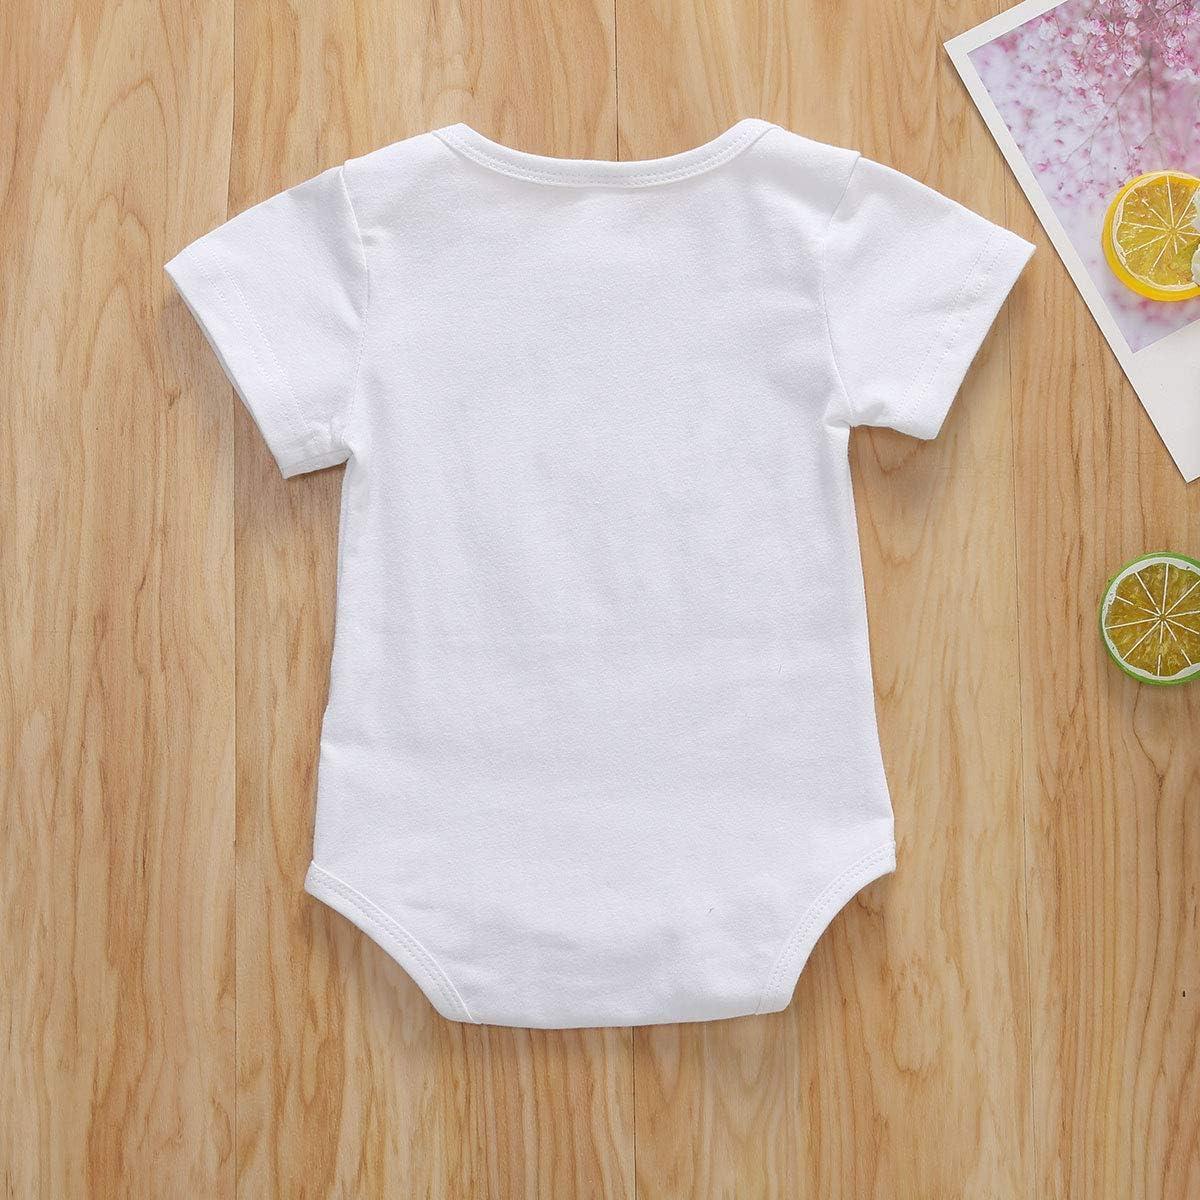 hujukuludusu Funny Sayings Printed Onesies Baby Girl Boy Bodysuit Cotton Short Sleeve Romper